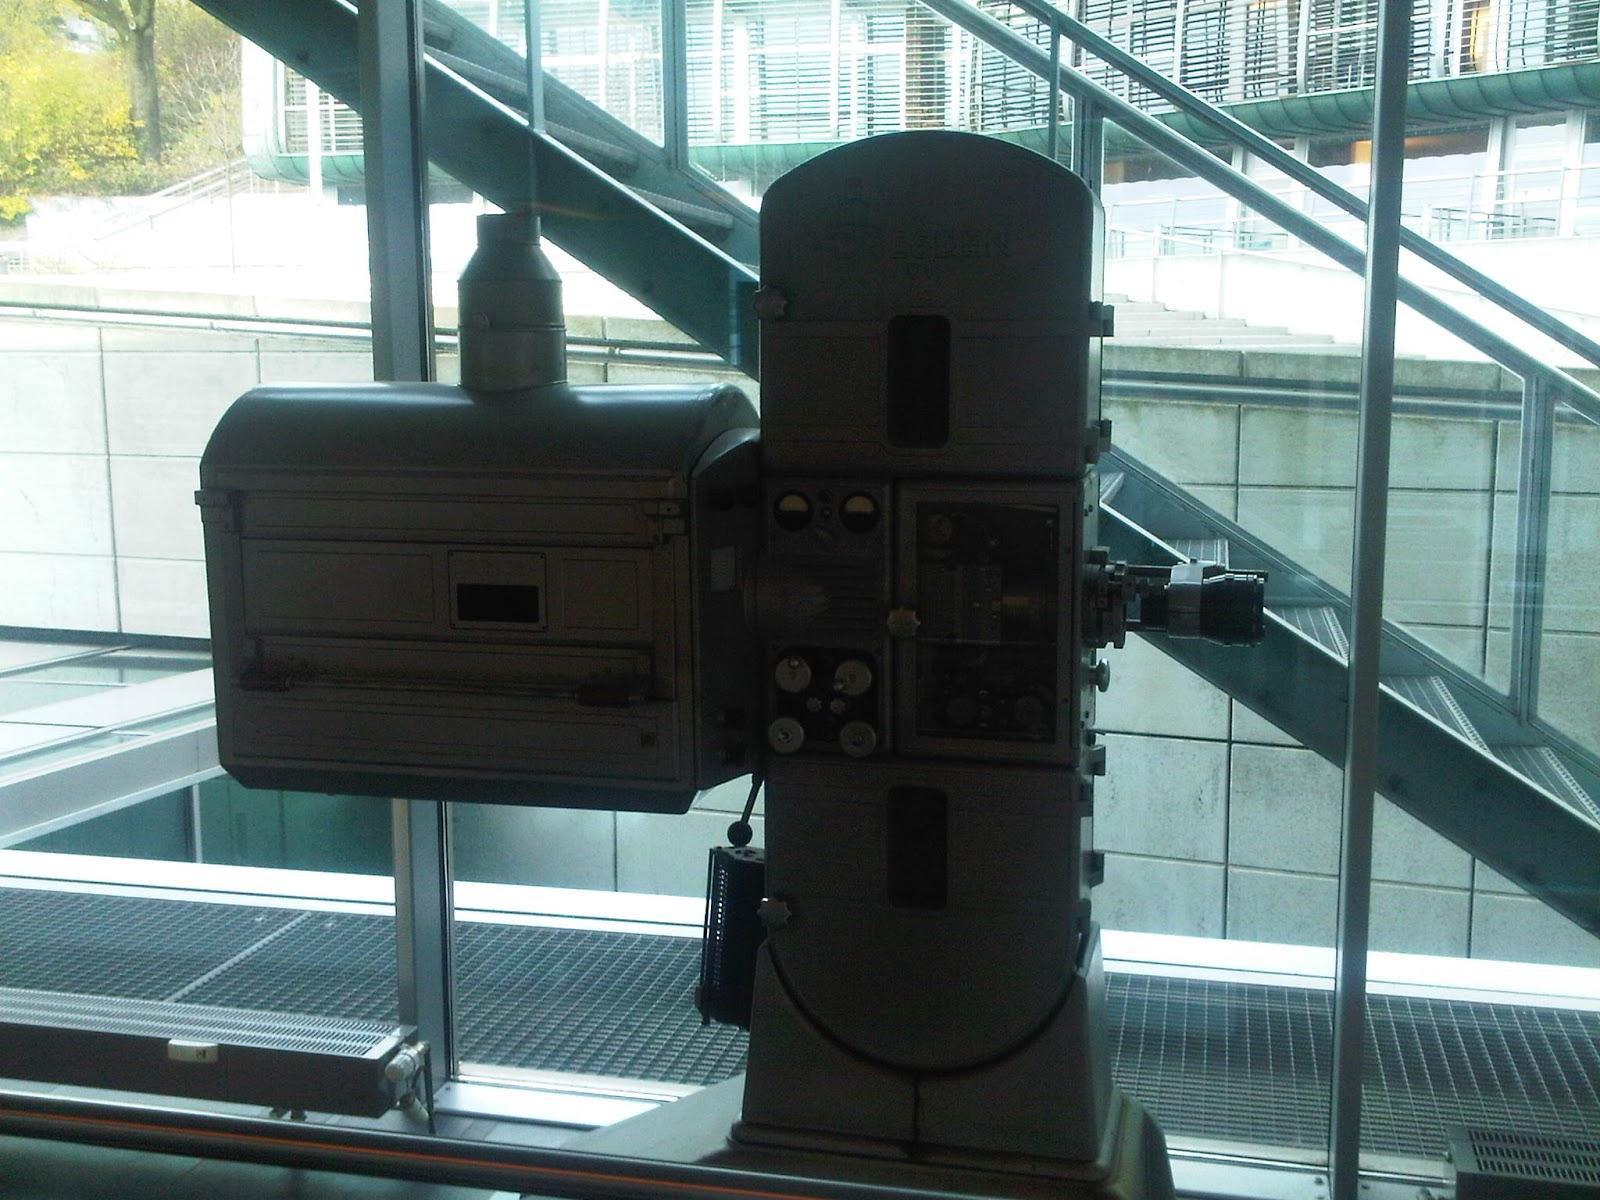 Filmprojektor im Bürogebäude